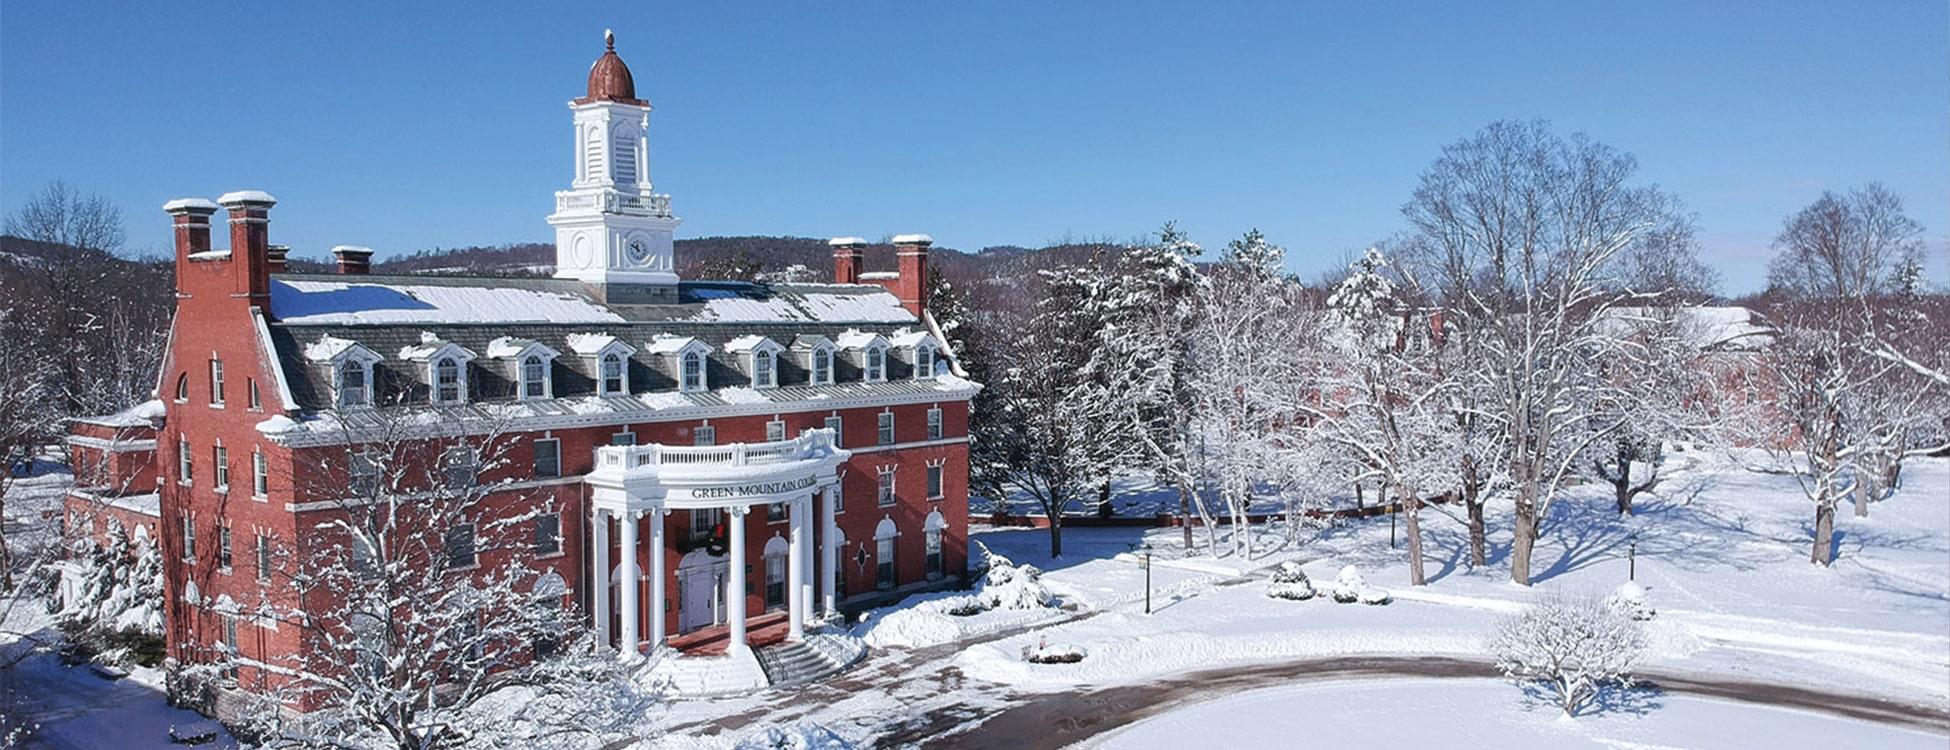 Green Mountain College, snow, winter